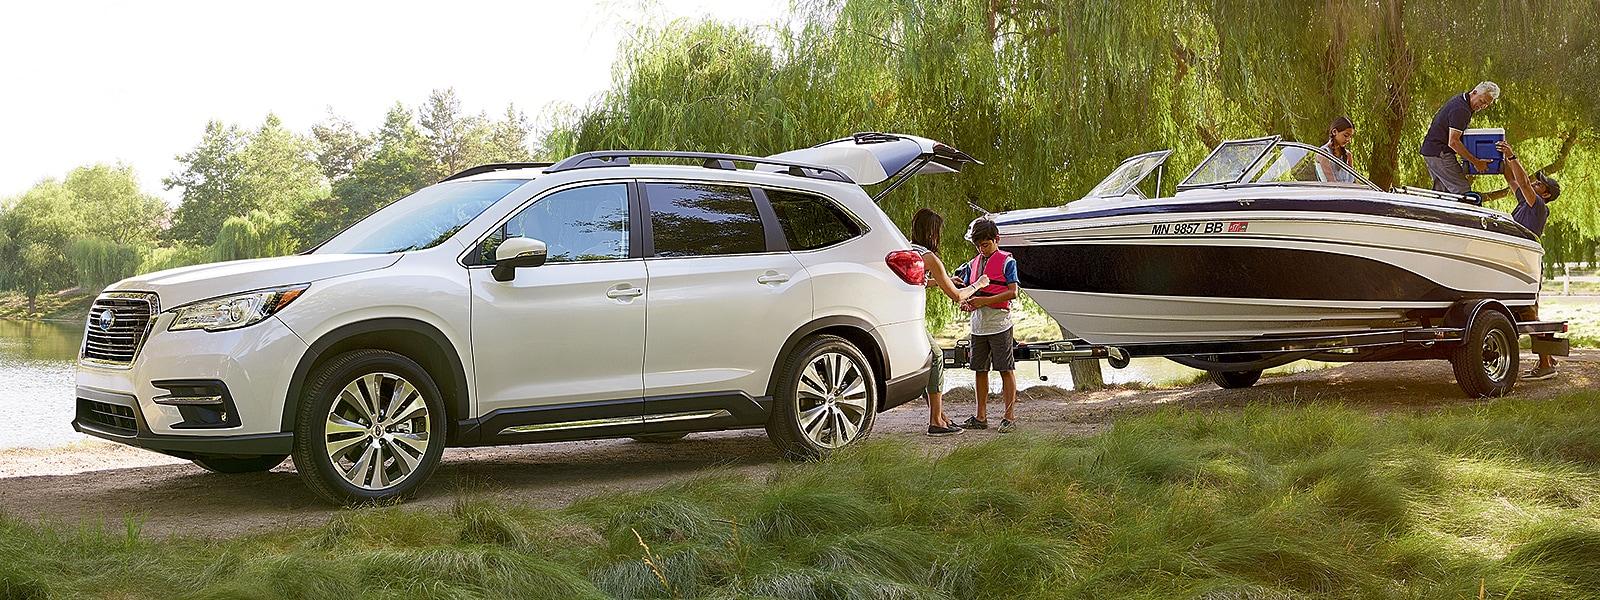 New Subaru Dealership Southwest Florida O Brien Subaru